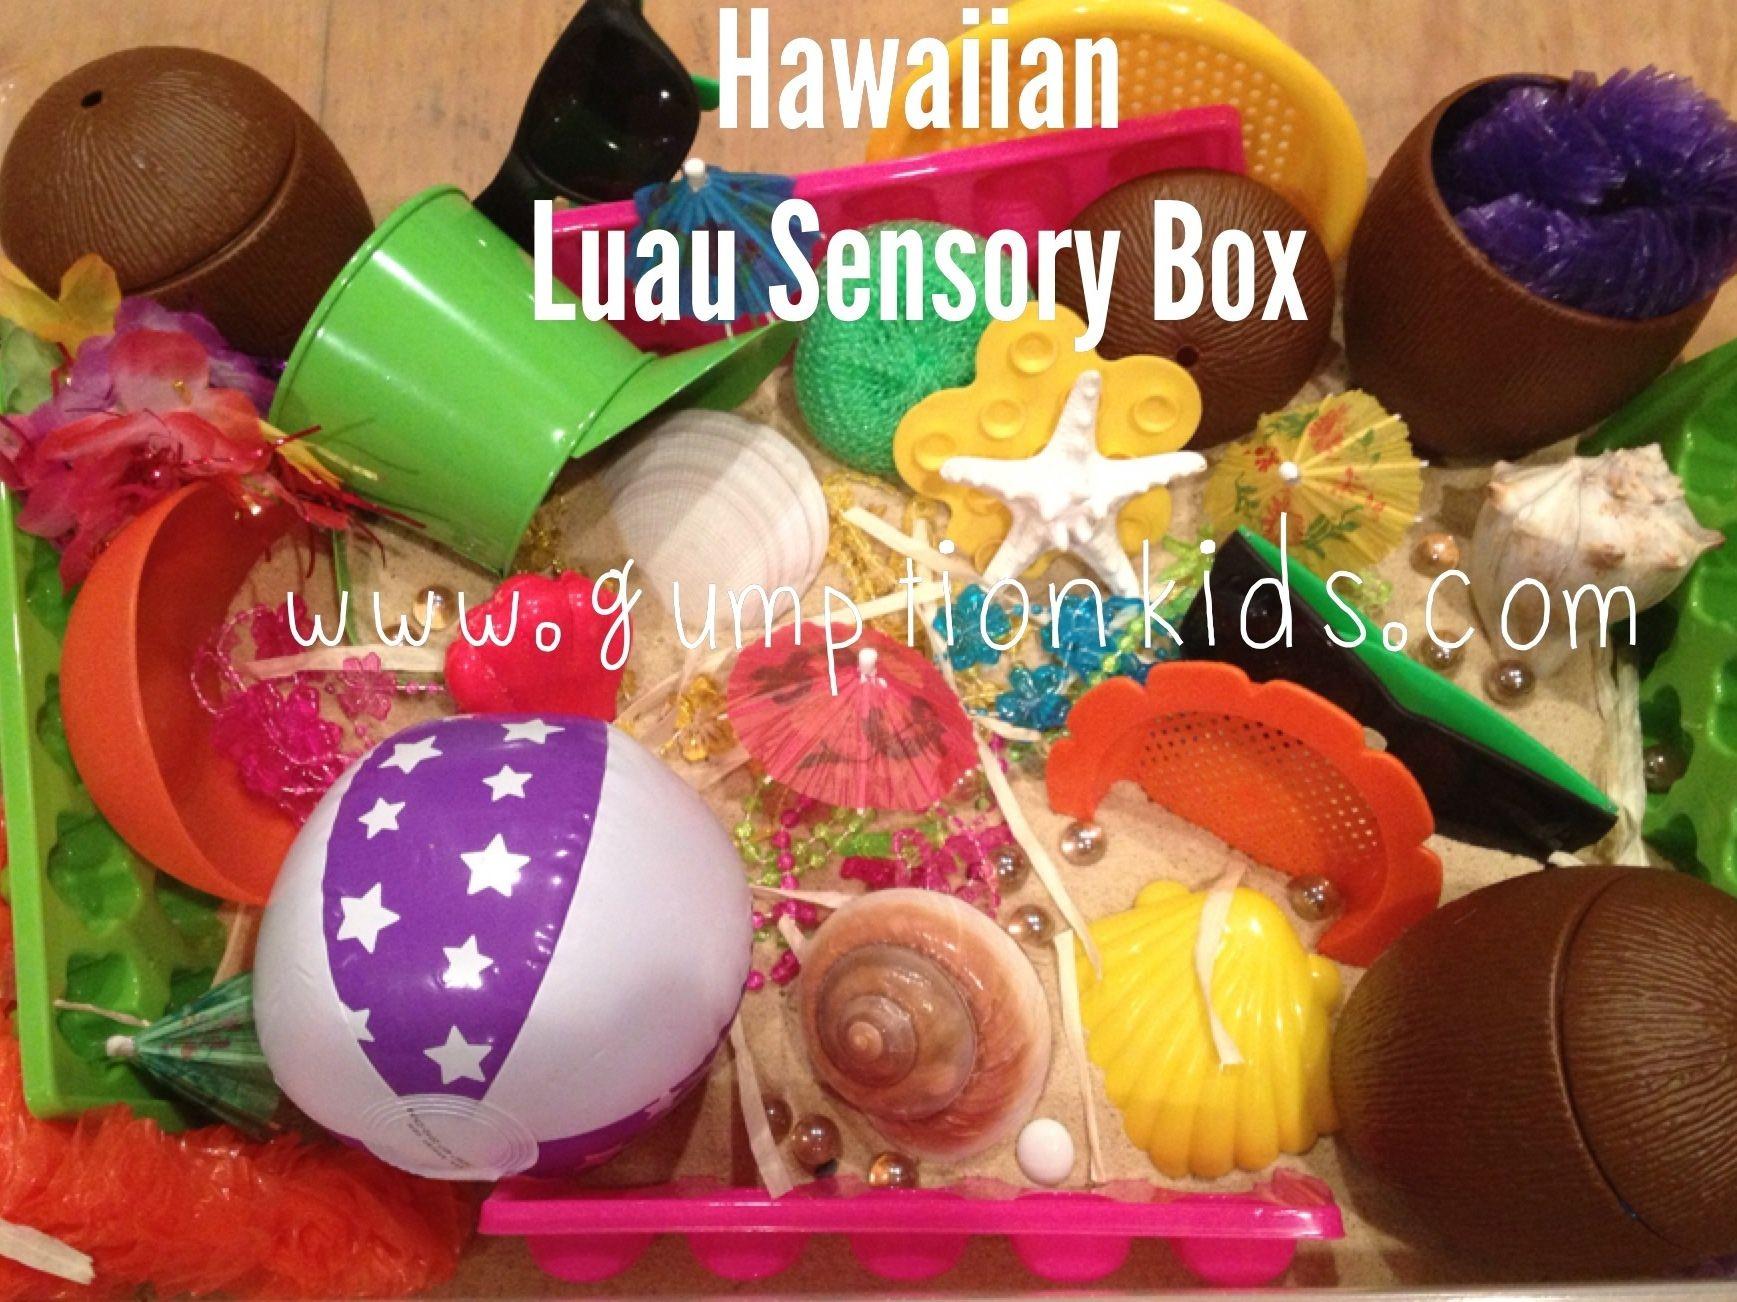 Hawaiian Luau Sensory Box